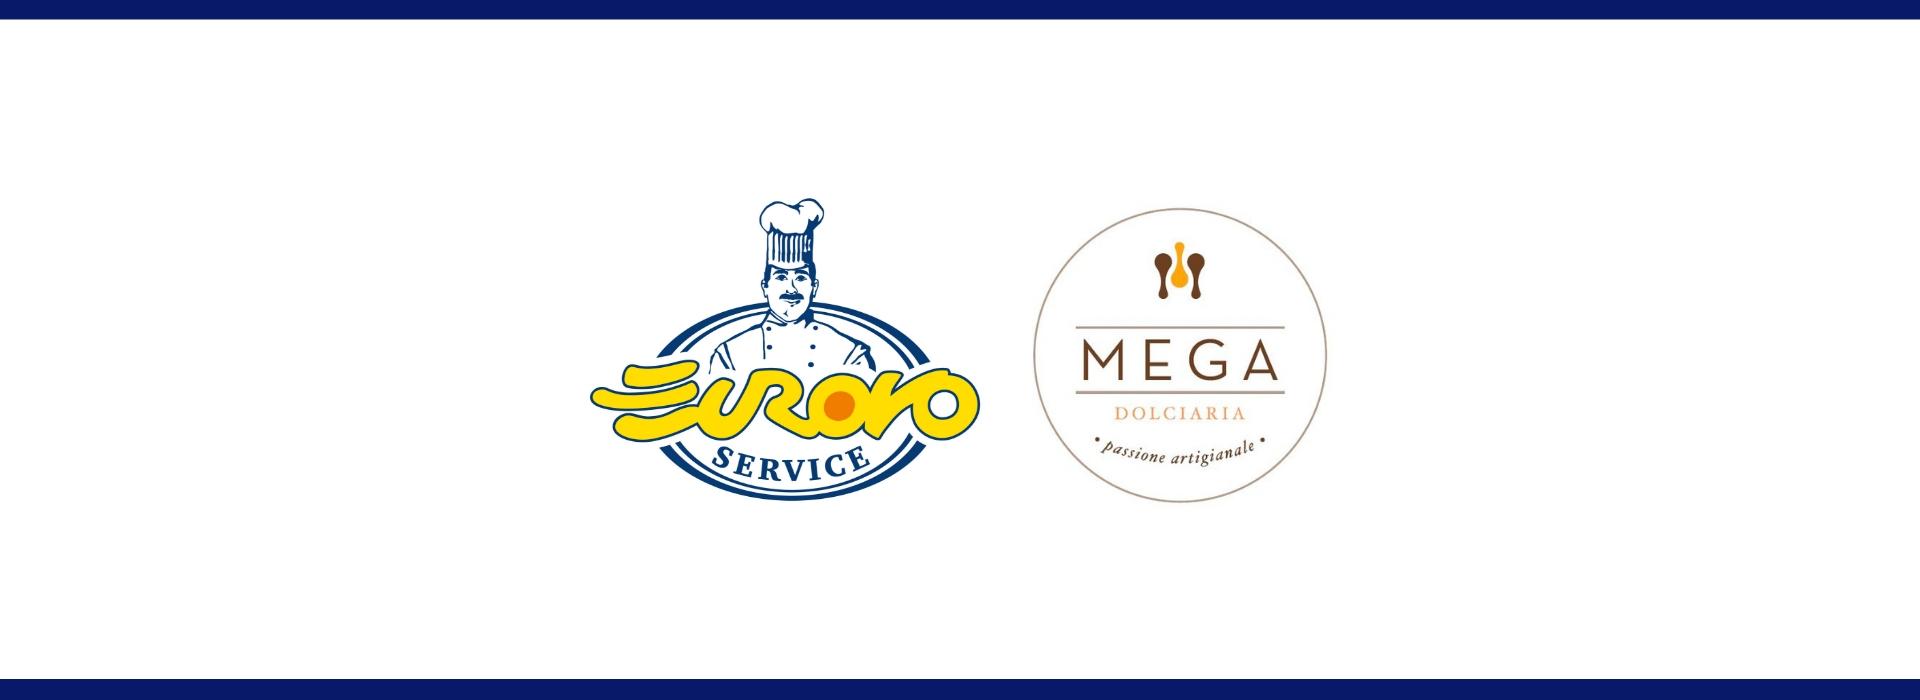 Eurovo Service e Mega Dolciaria: partnership nel canale Bakery